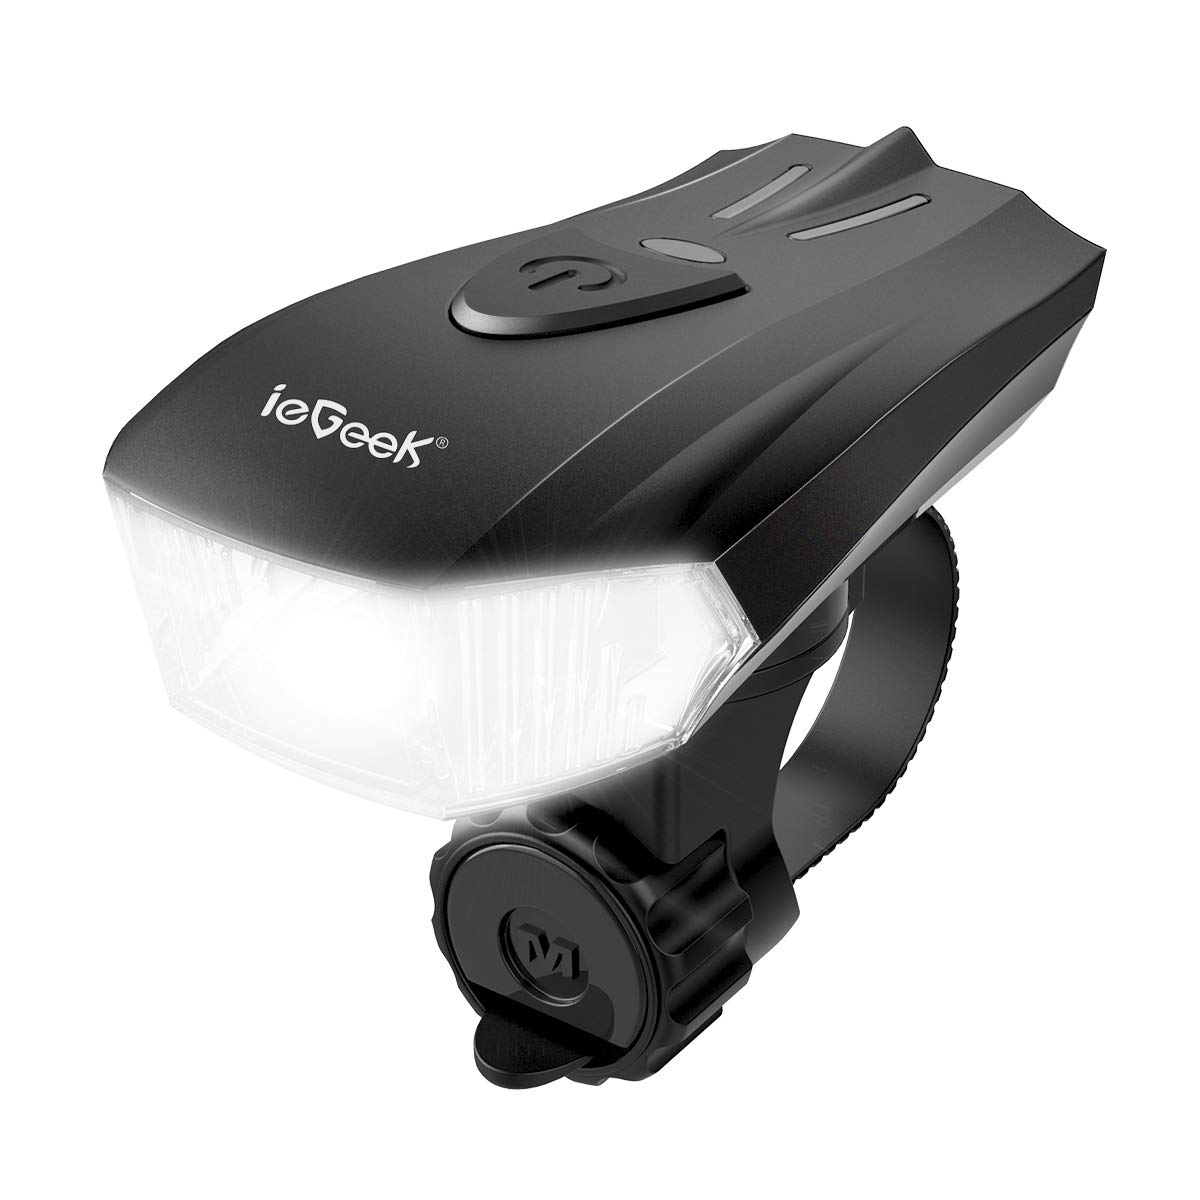 iegeek eclairage v lo lampe de v lo usb rechargeable led. Black Bedroom Furniture Sets. Home Design Ideas